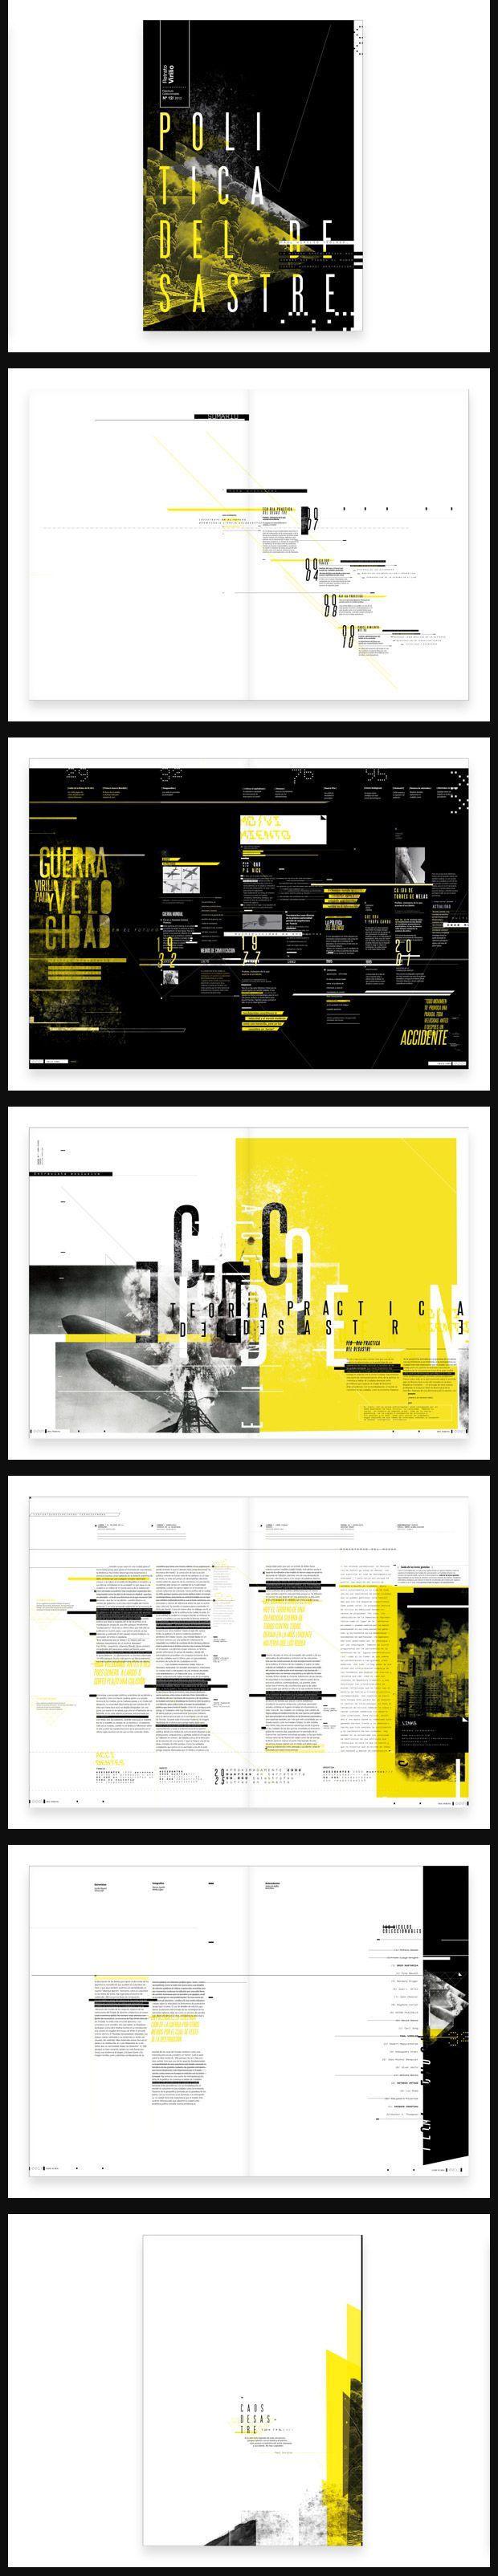 Fasciculo - Paul Virilio // Editorial Design, Graphic Design, Typography // Alejandra Tramontte